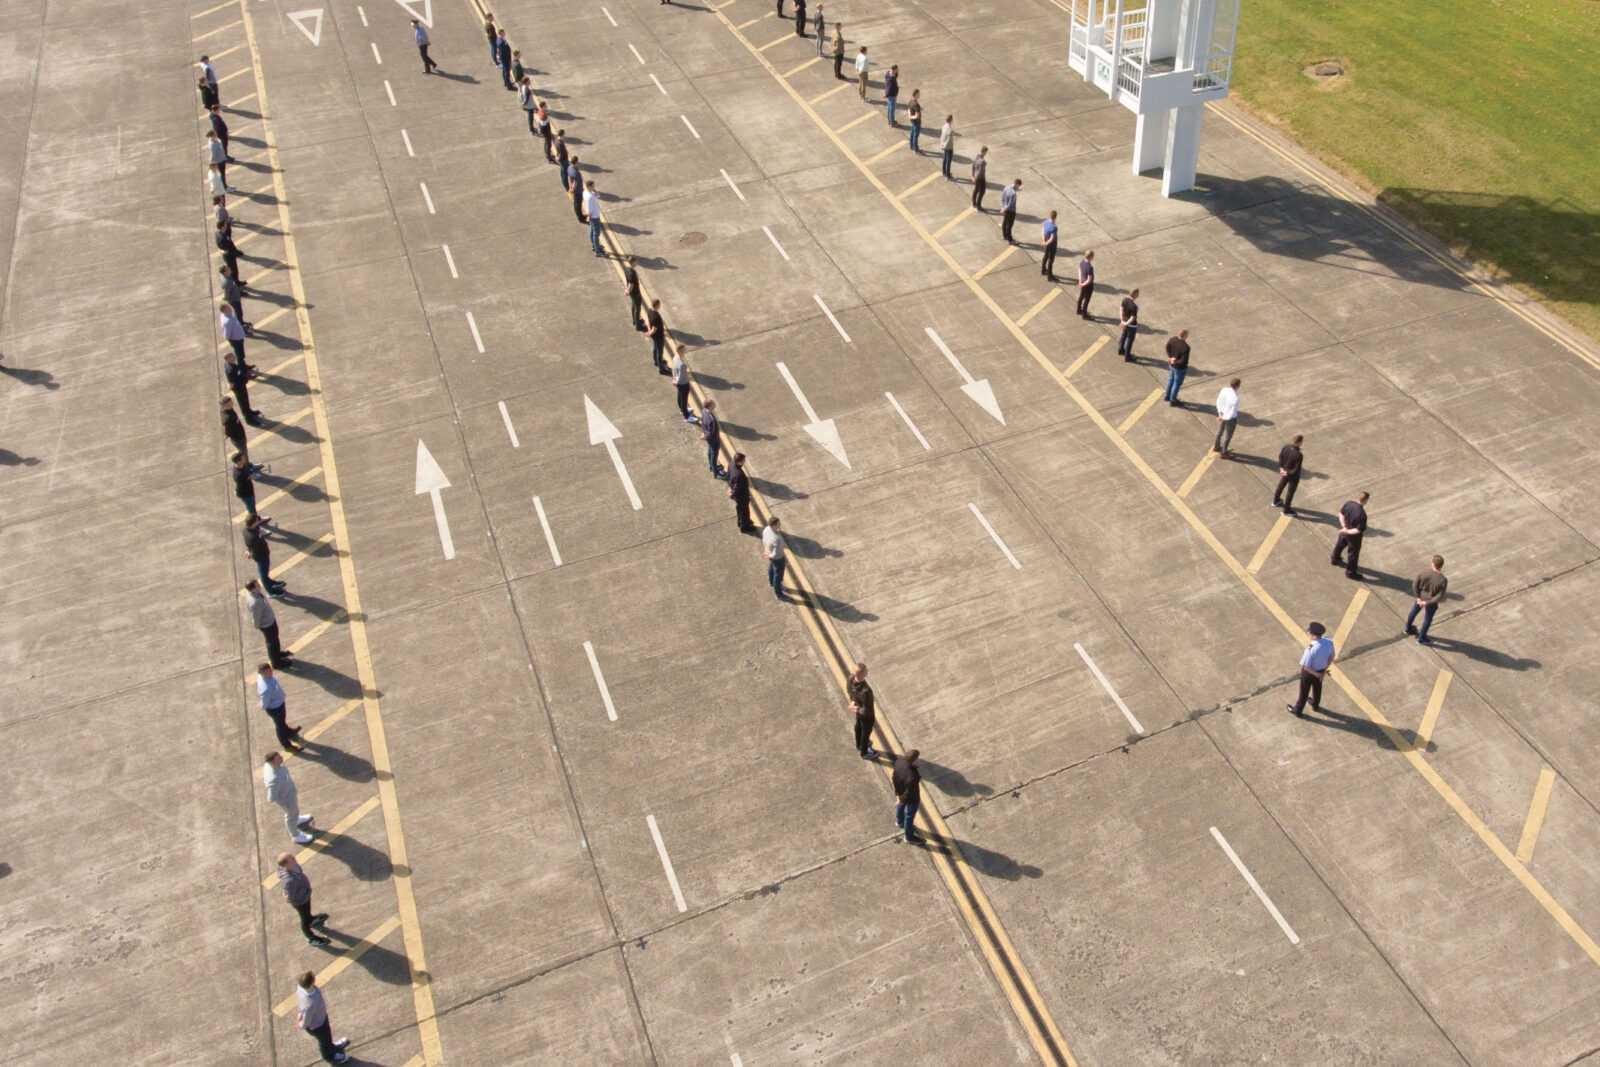 Training in Lockdown